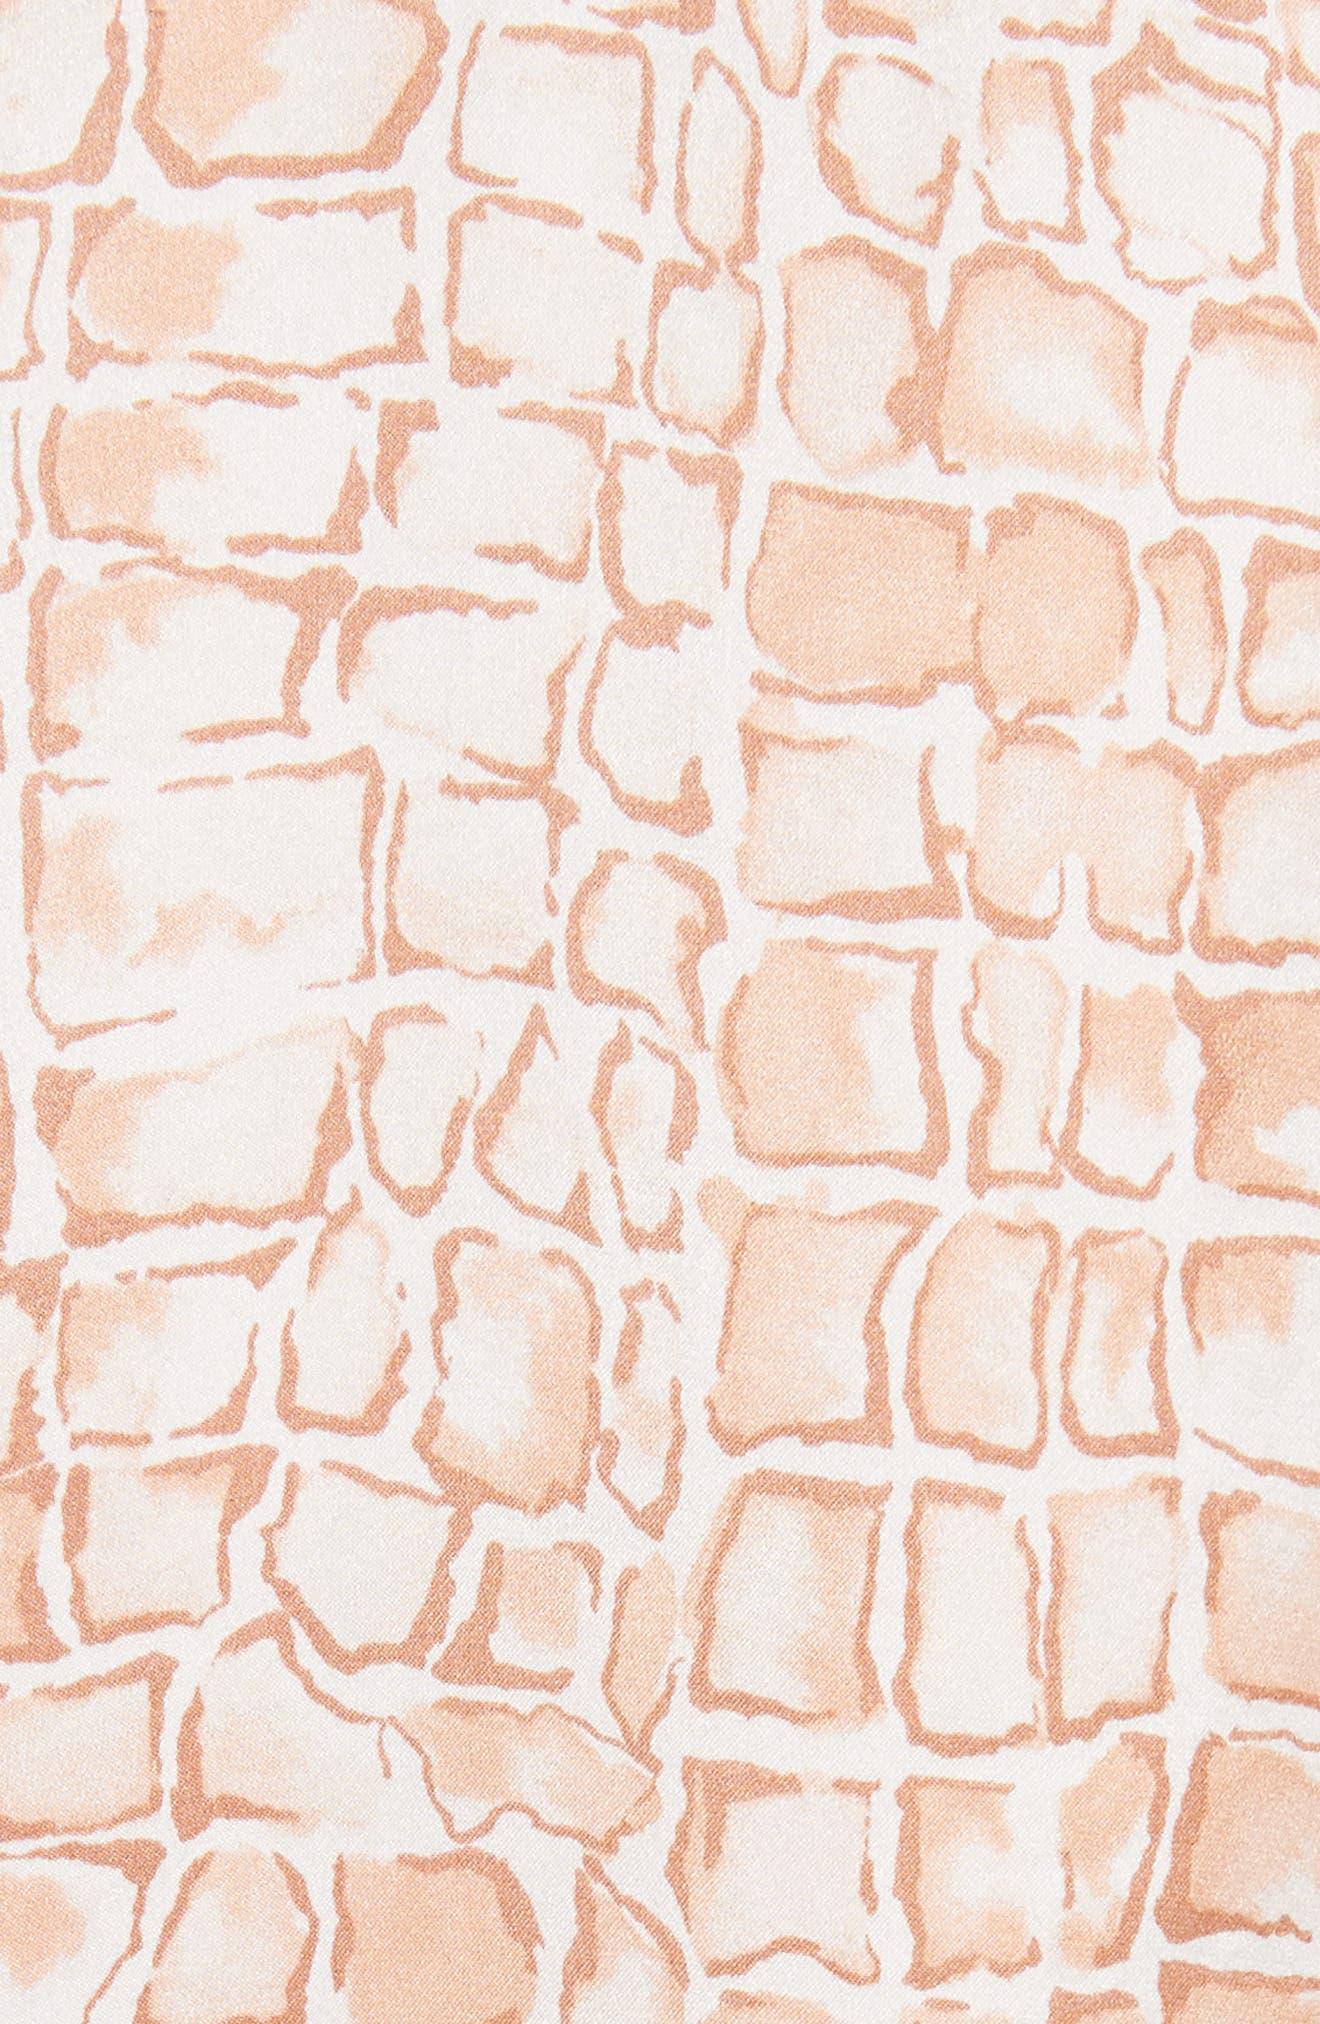 Huntley Silk Blouse,                             Alternate thumbnail 5, color,                             Flushed Multi